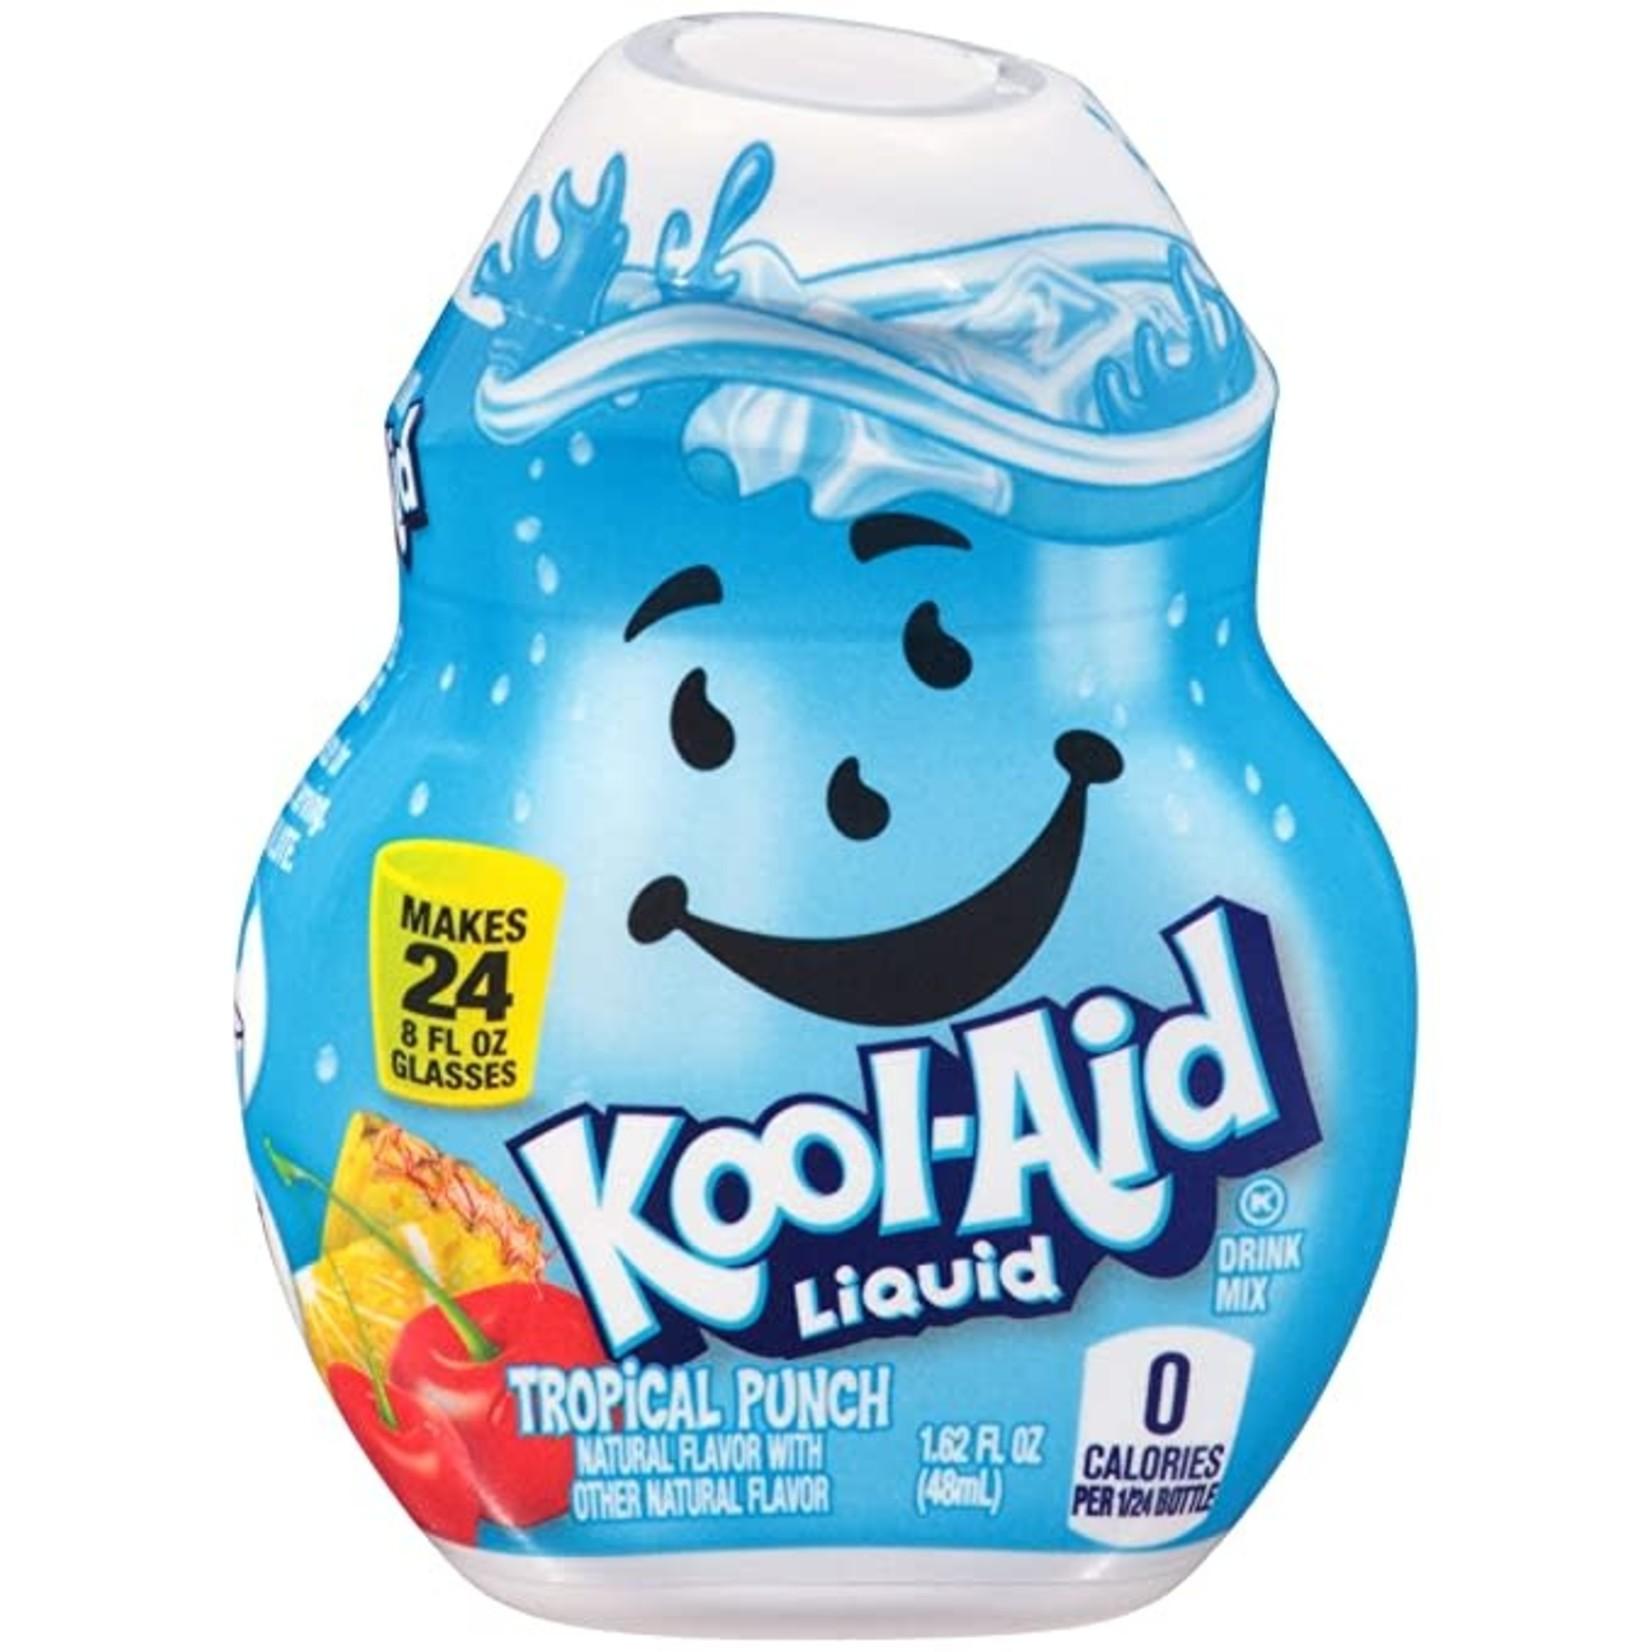 Kool-Aid Tropical Punch Liquid  1.62oz (Box of 12)